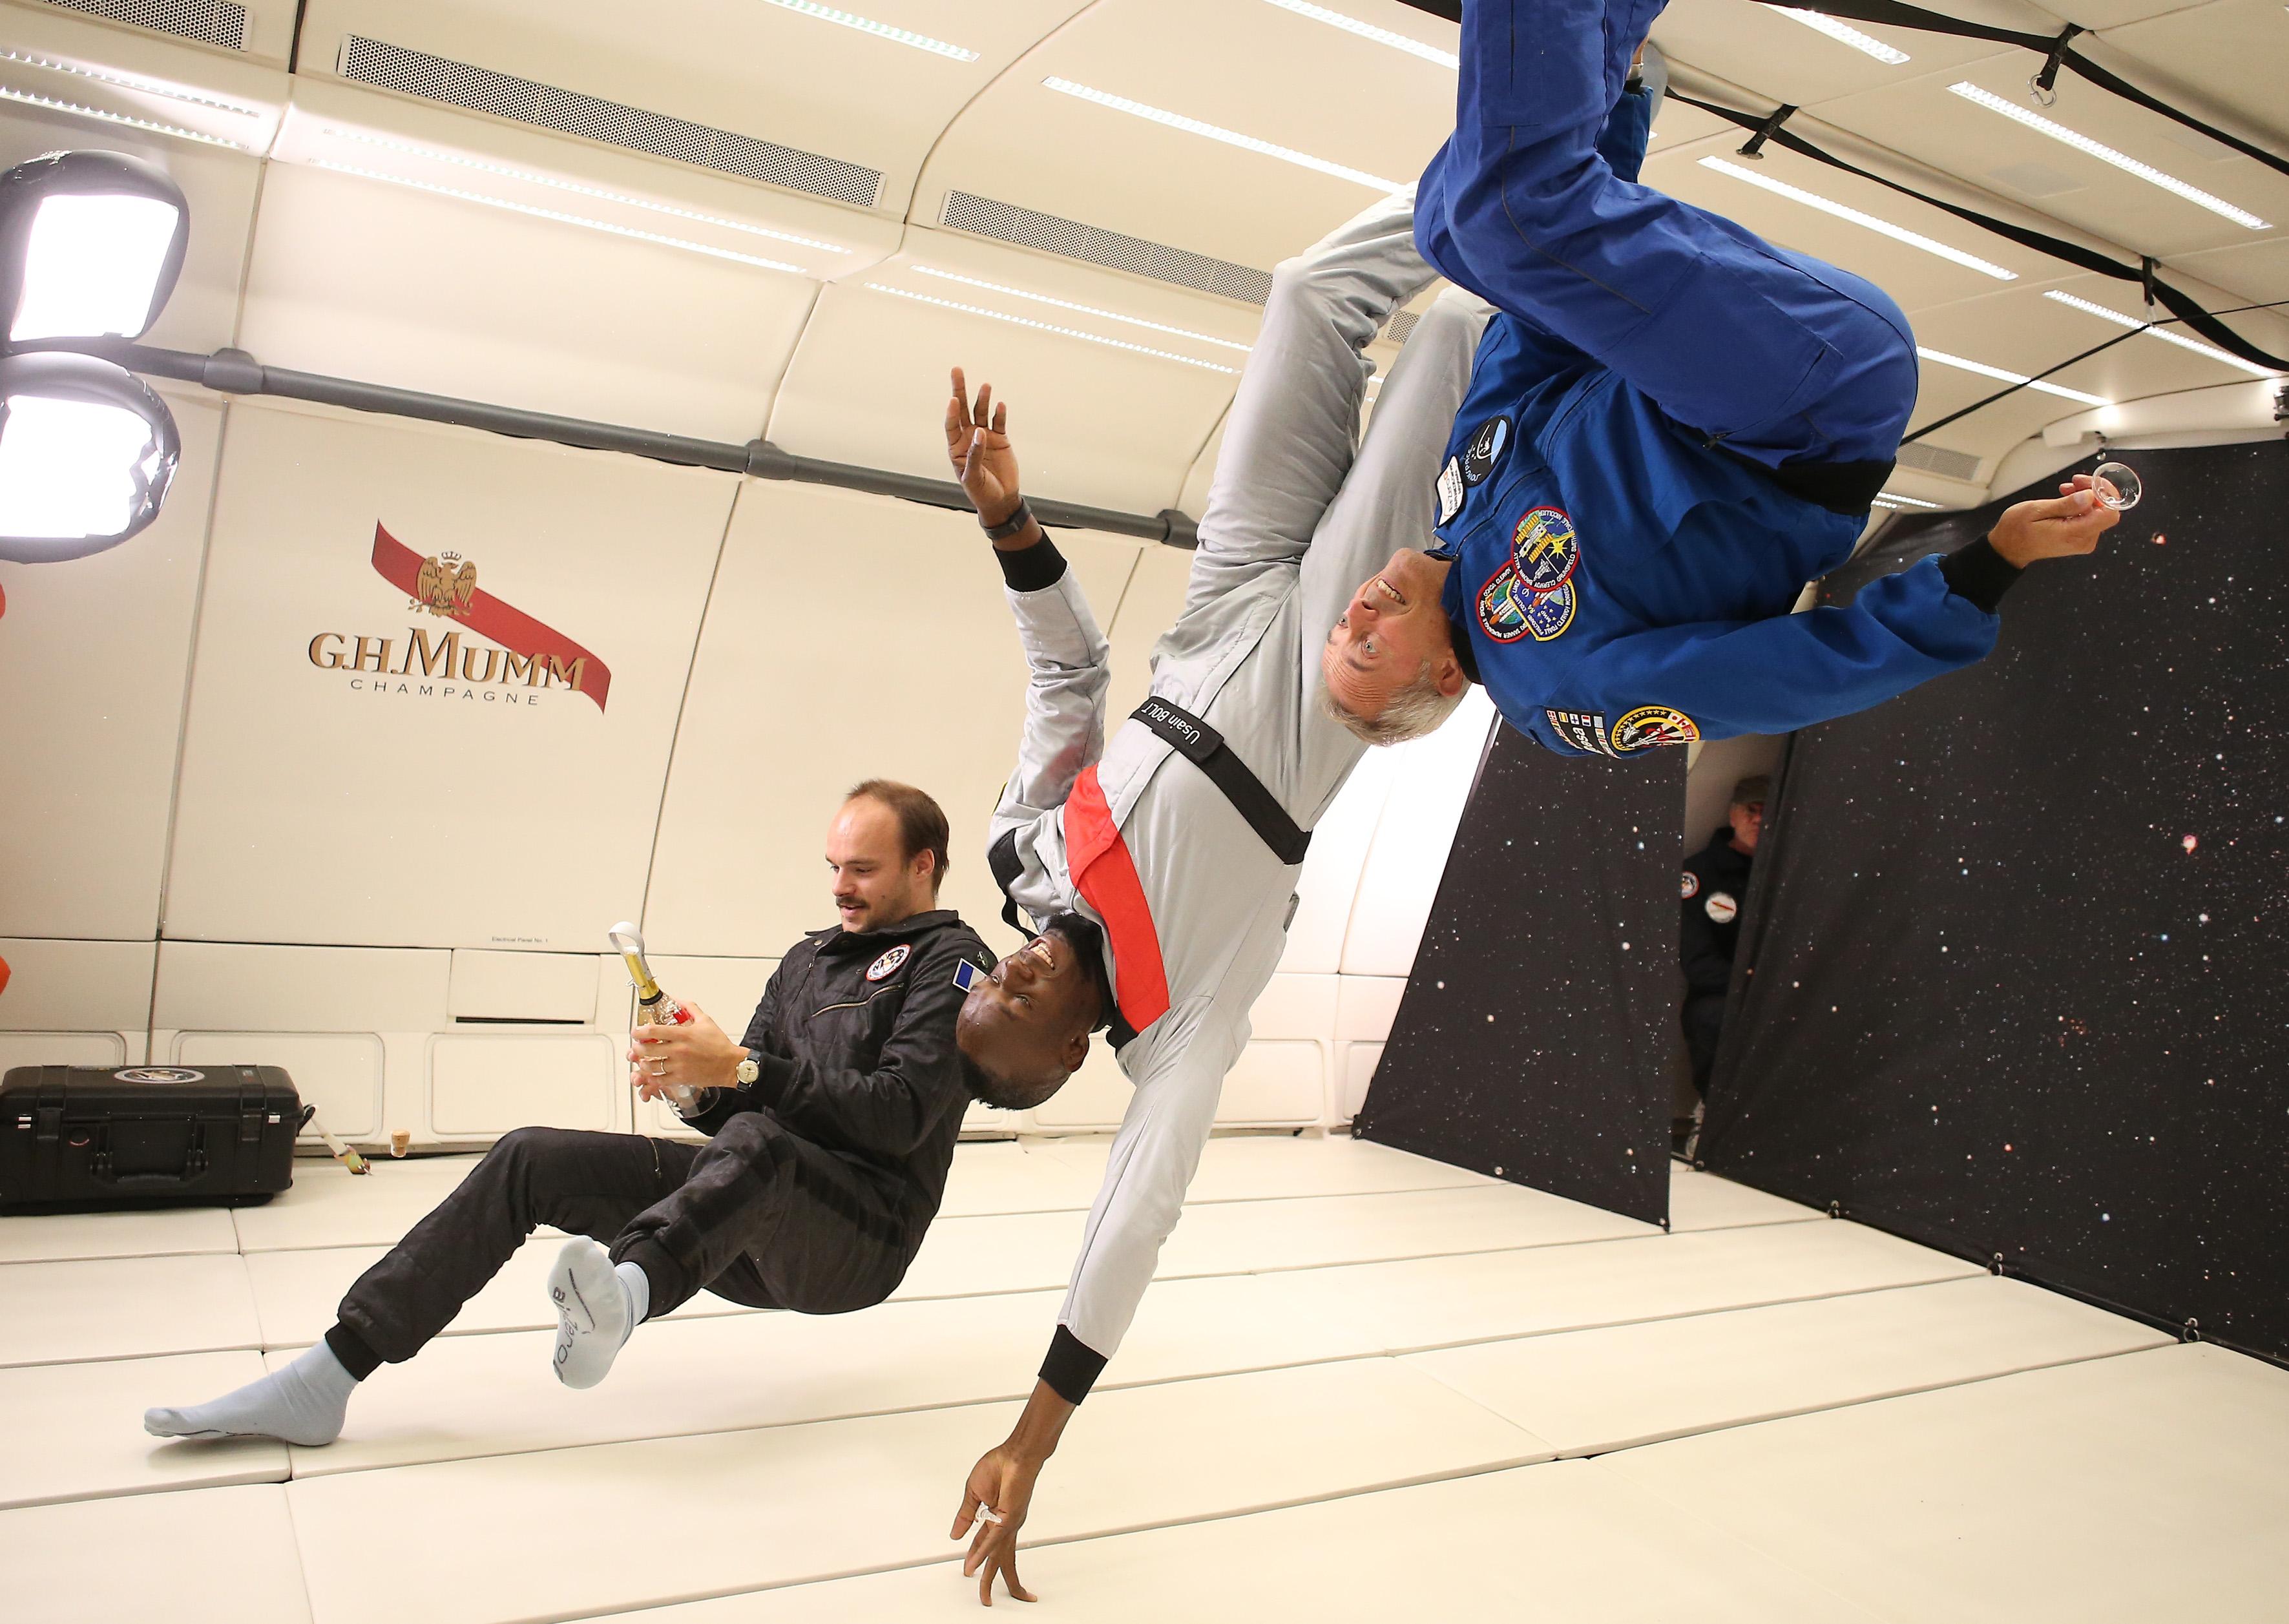 Usain Bolt tries Champagne Mumm's space Champagne in zero gravity